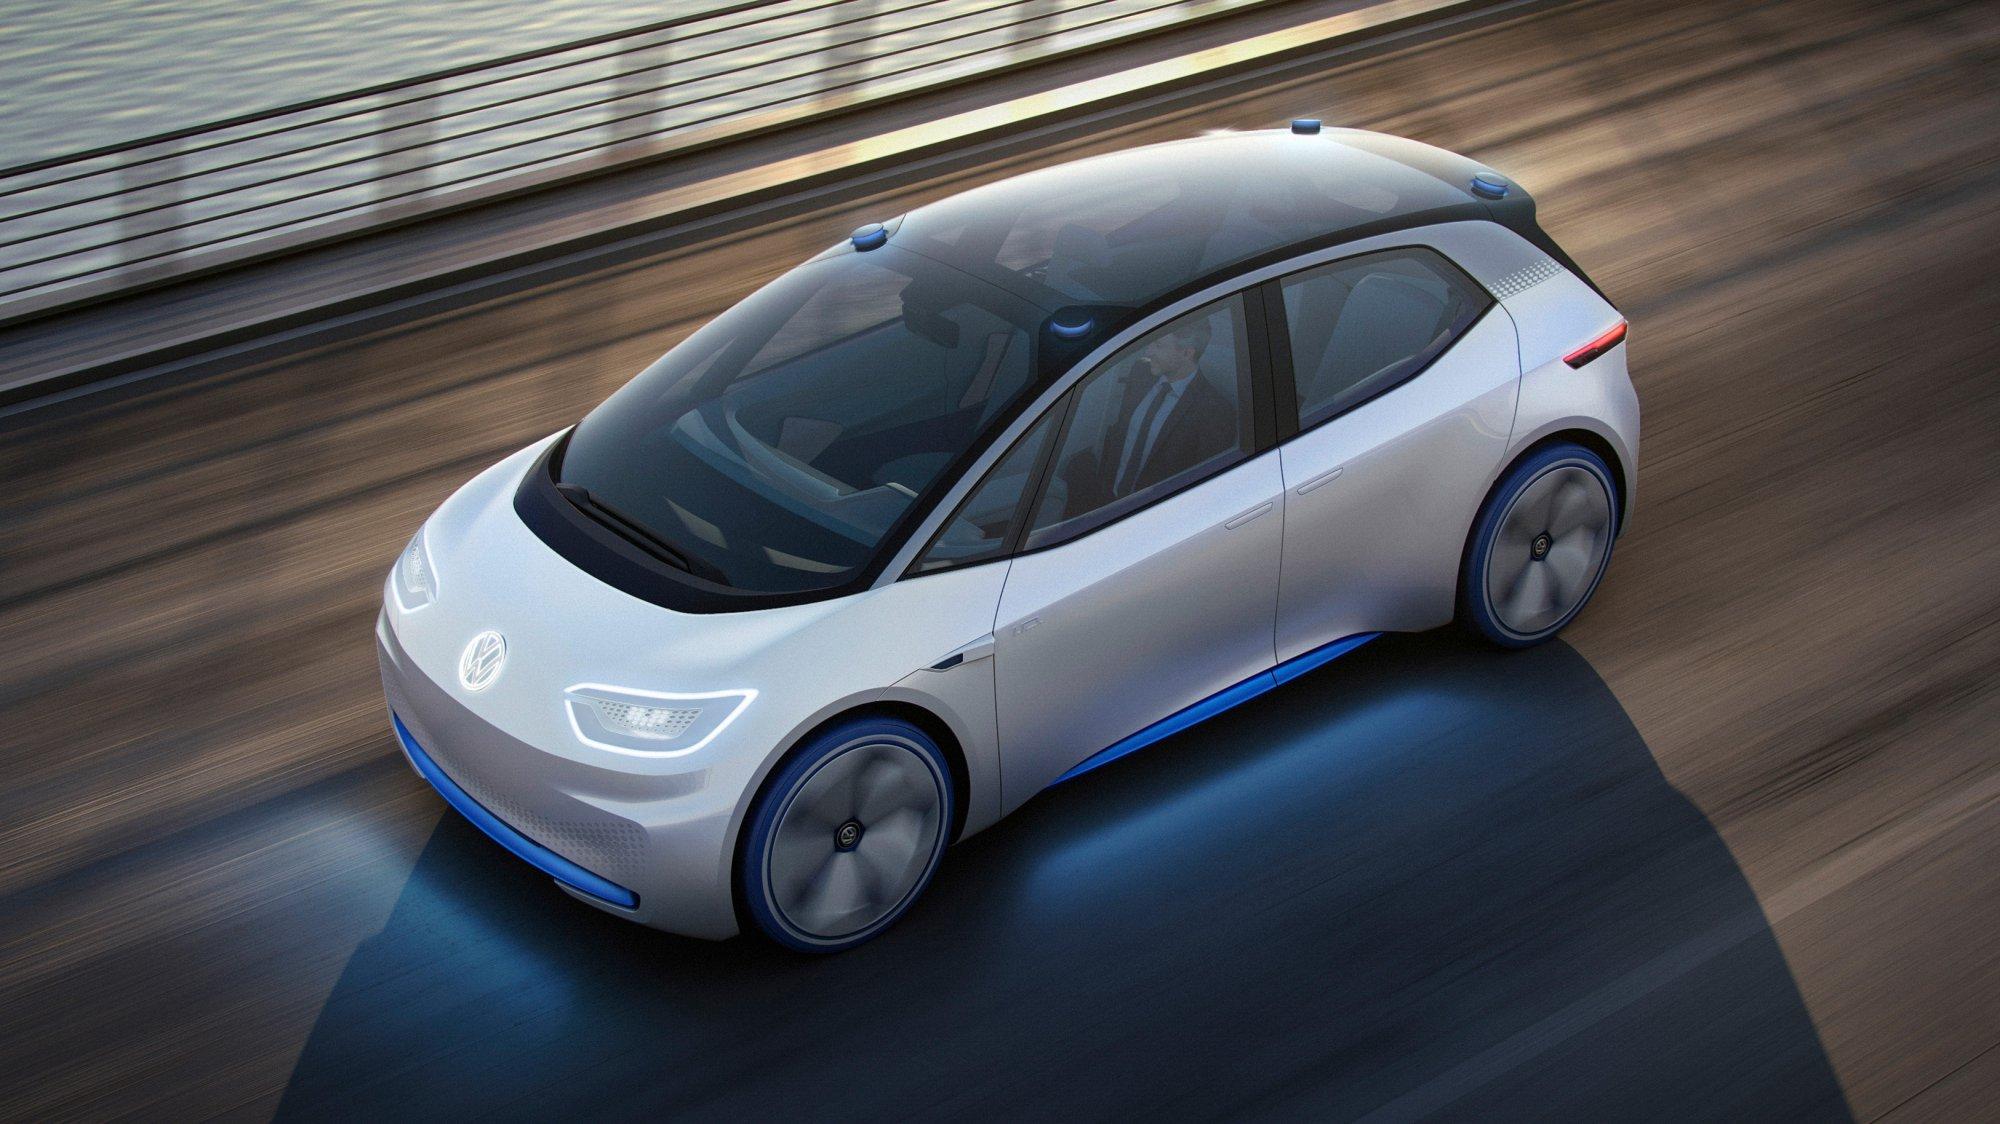 Land Rover Range Rover >> News - Volkswagen ID Hatch To Undercut Tesla Model 3 By $9000